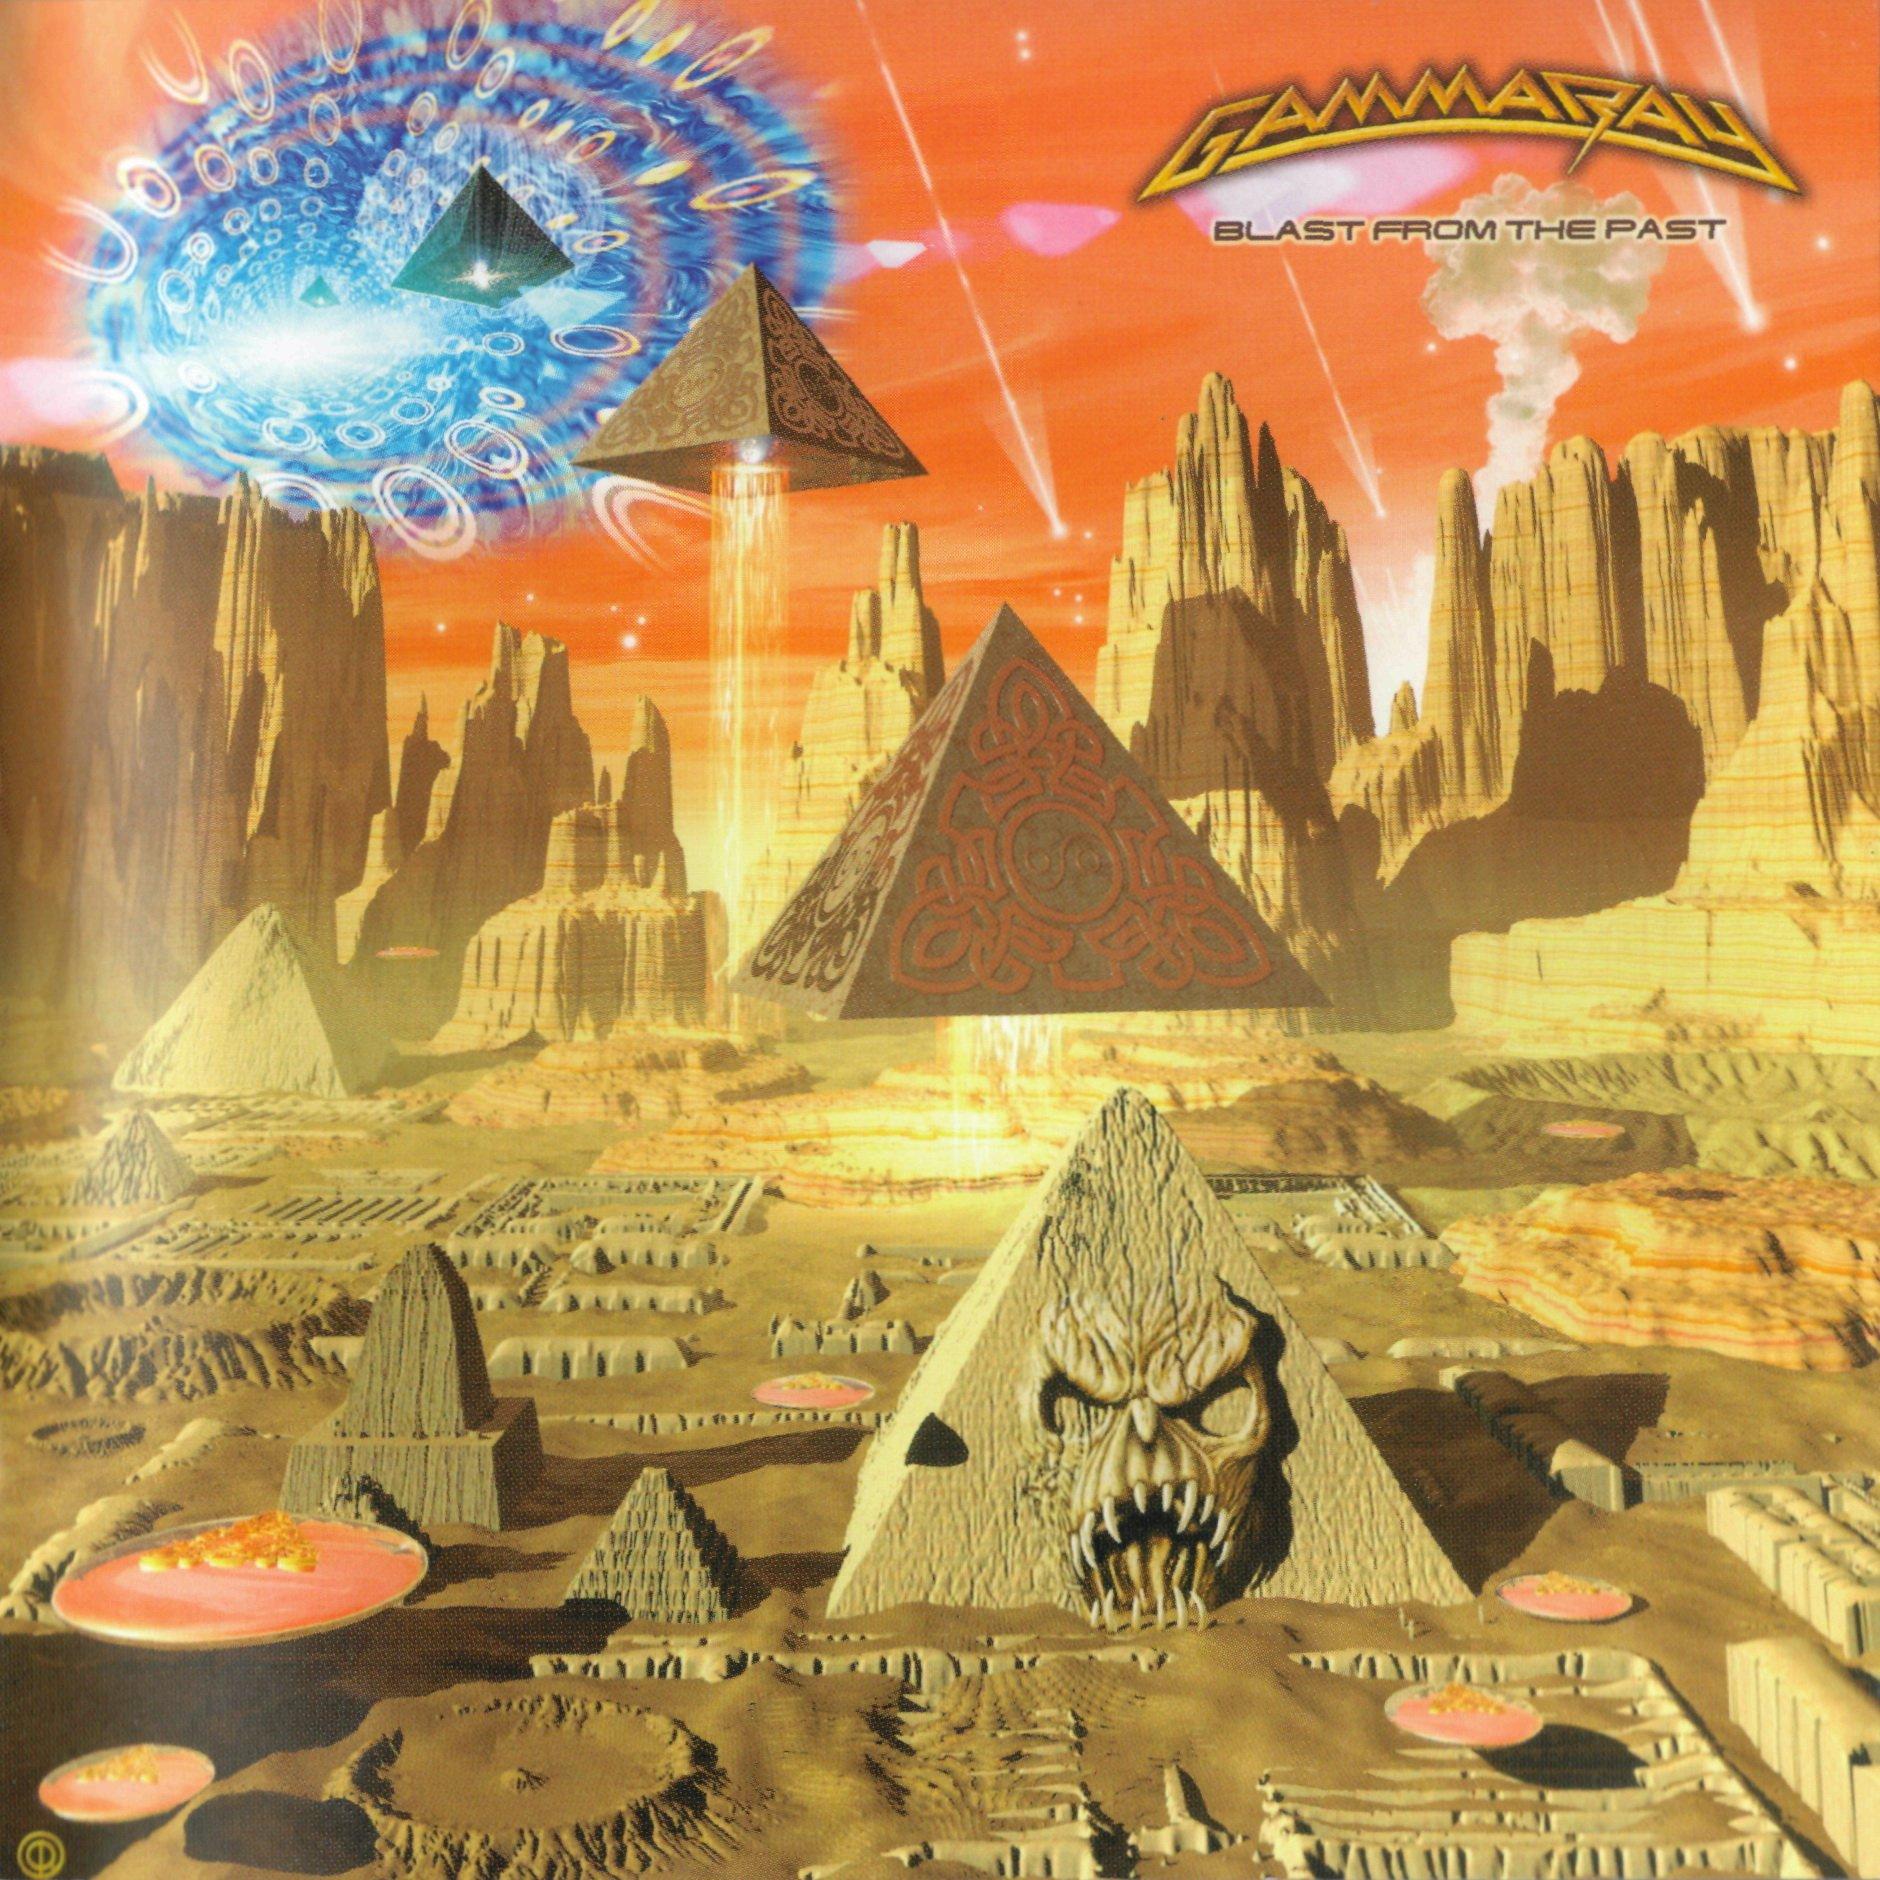 Blast From The Past Gamma Ray Last Fm